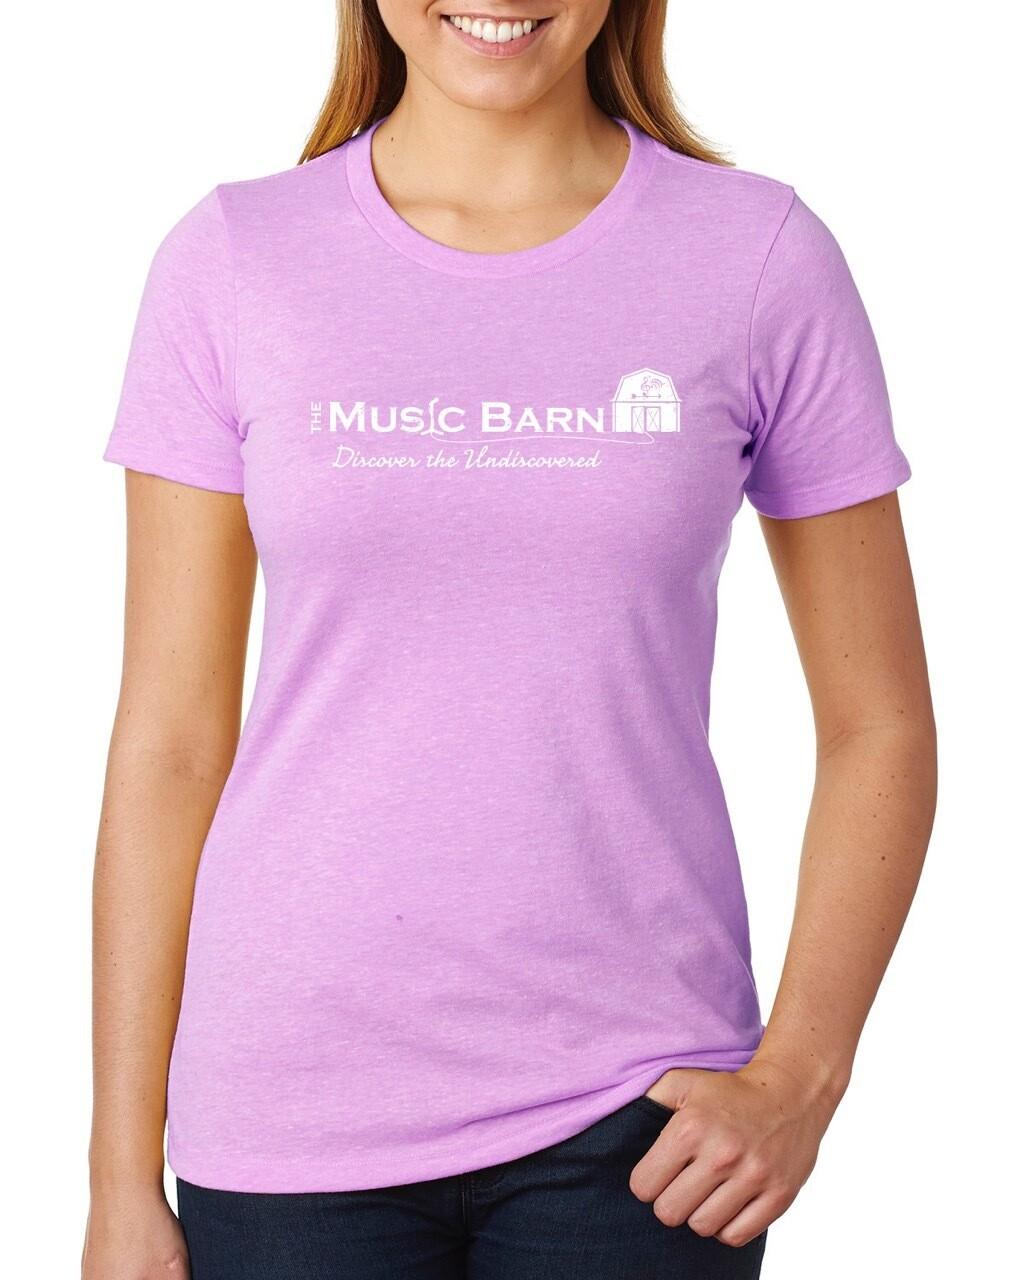 Music Barn Classic Tee - Lilac